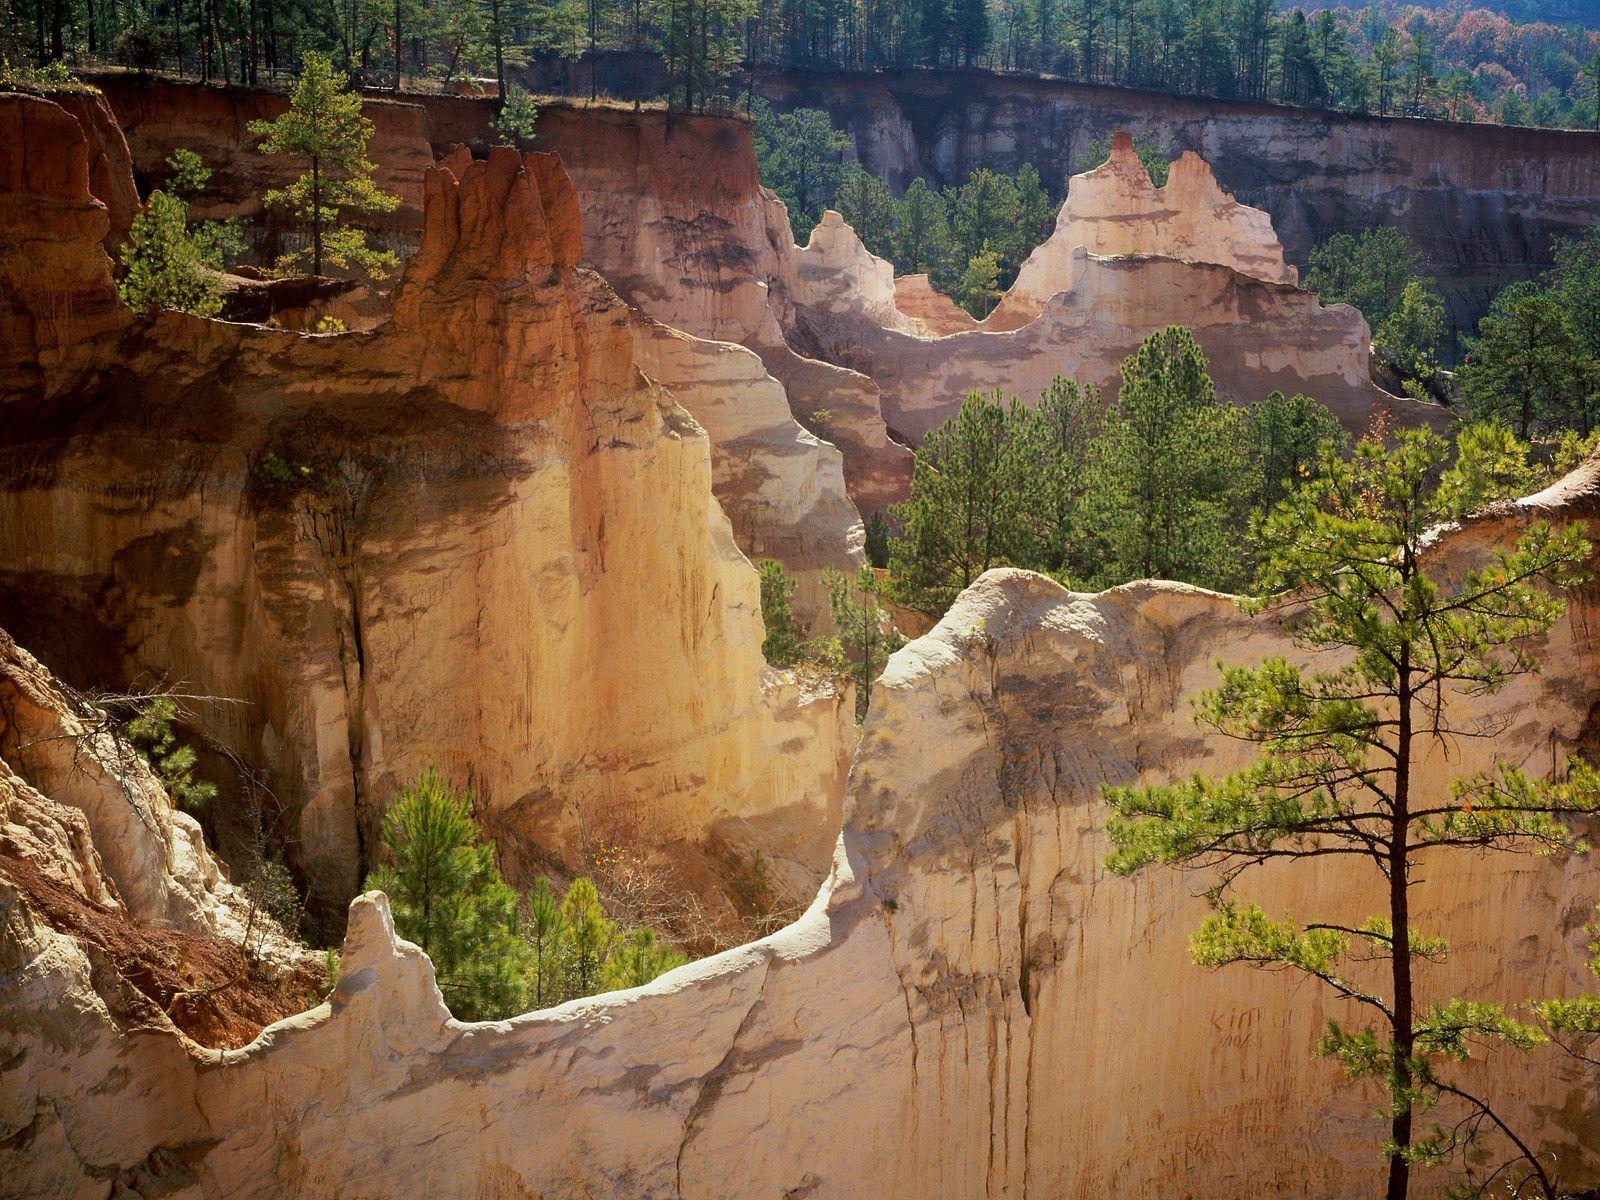 Providence Canyon State Park Lumpkin Georgia widescreen wallpaper 1600x1200